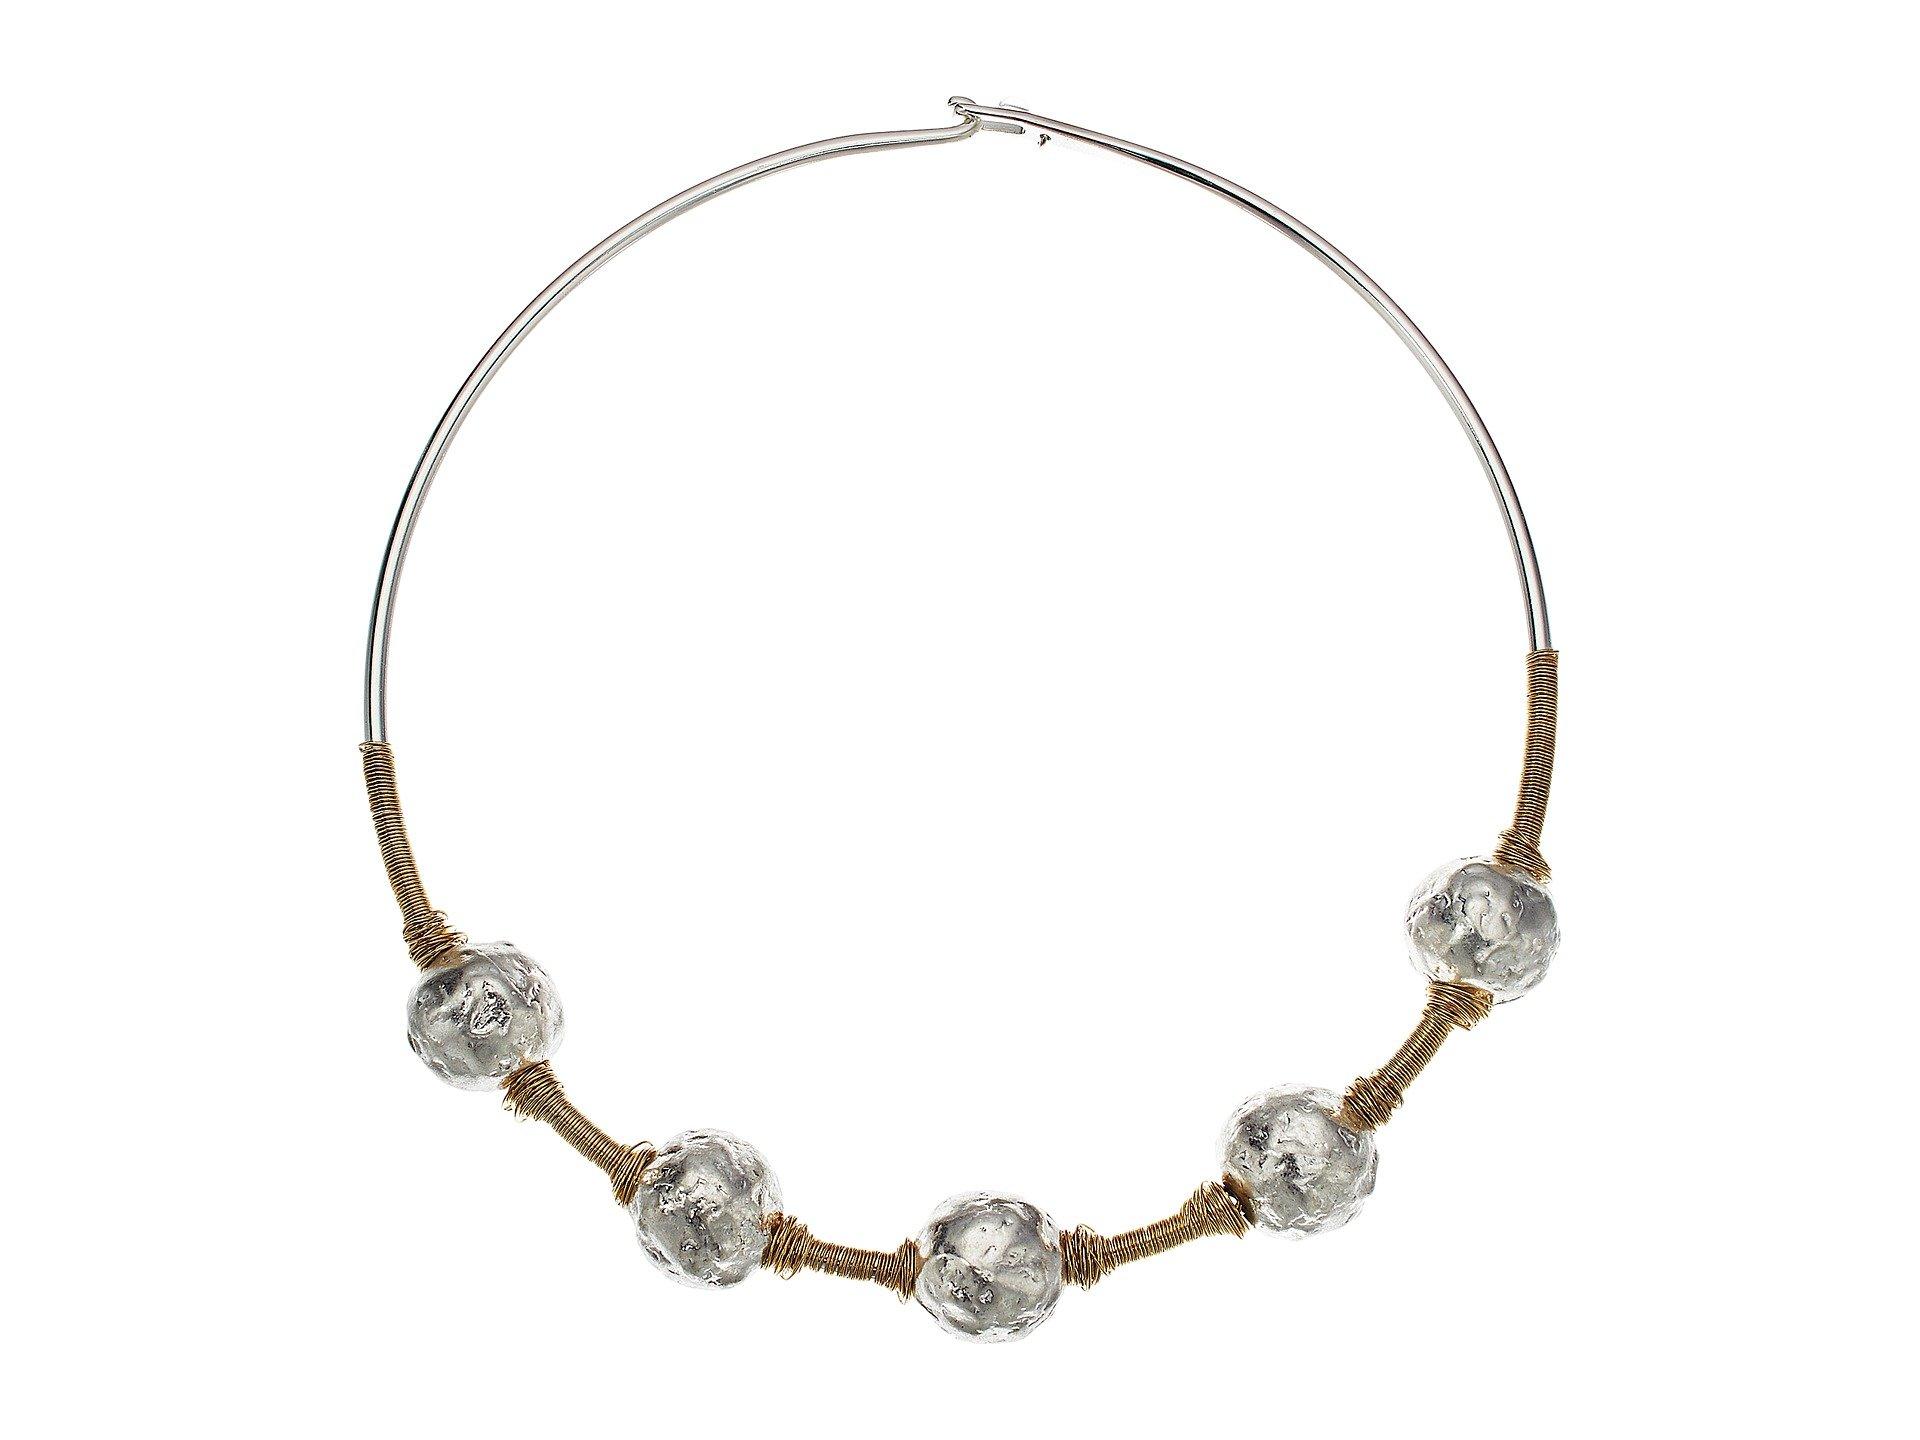 Robert Lee Morris Sculptural Bead Wire Collar Necklace at Zappos.com